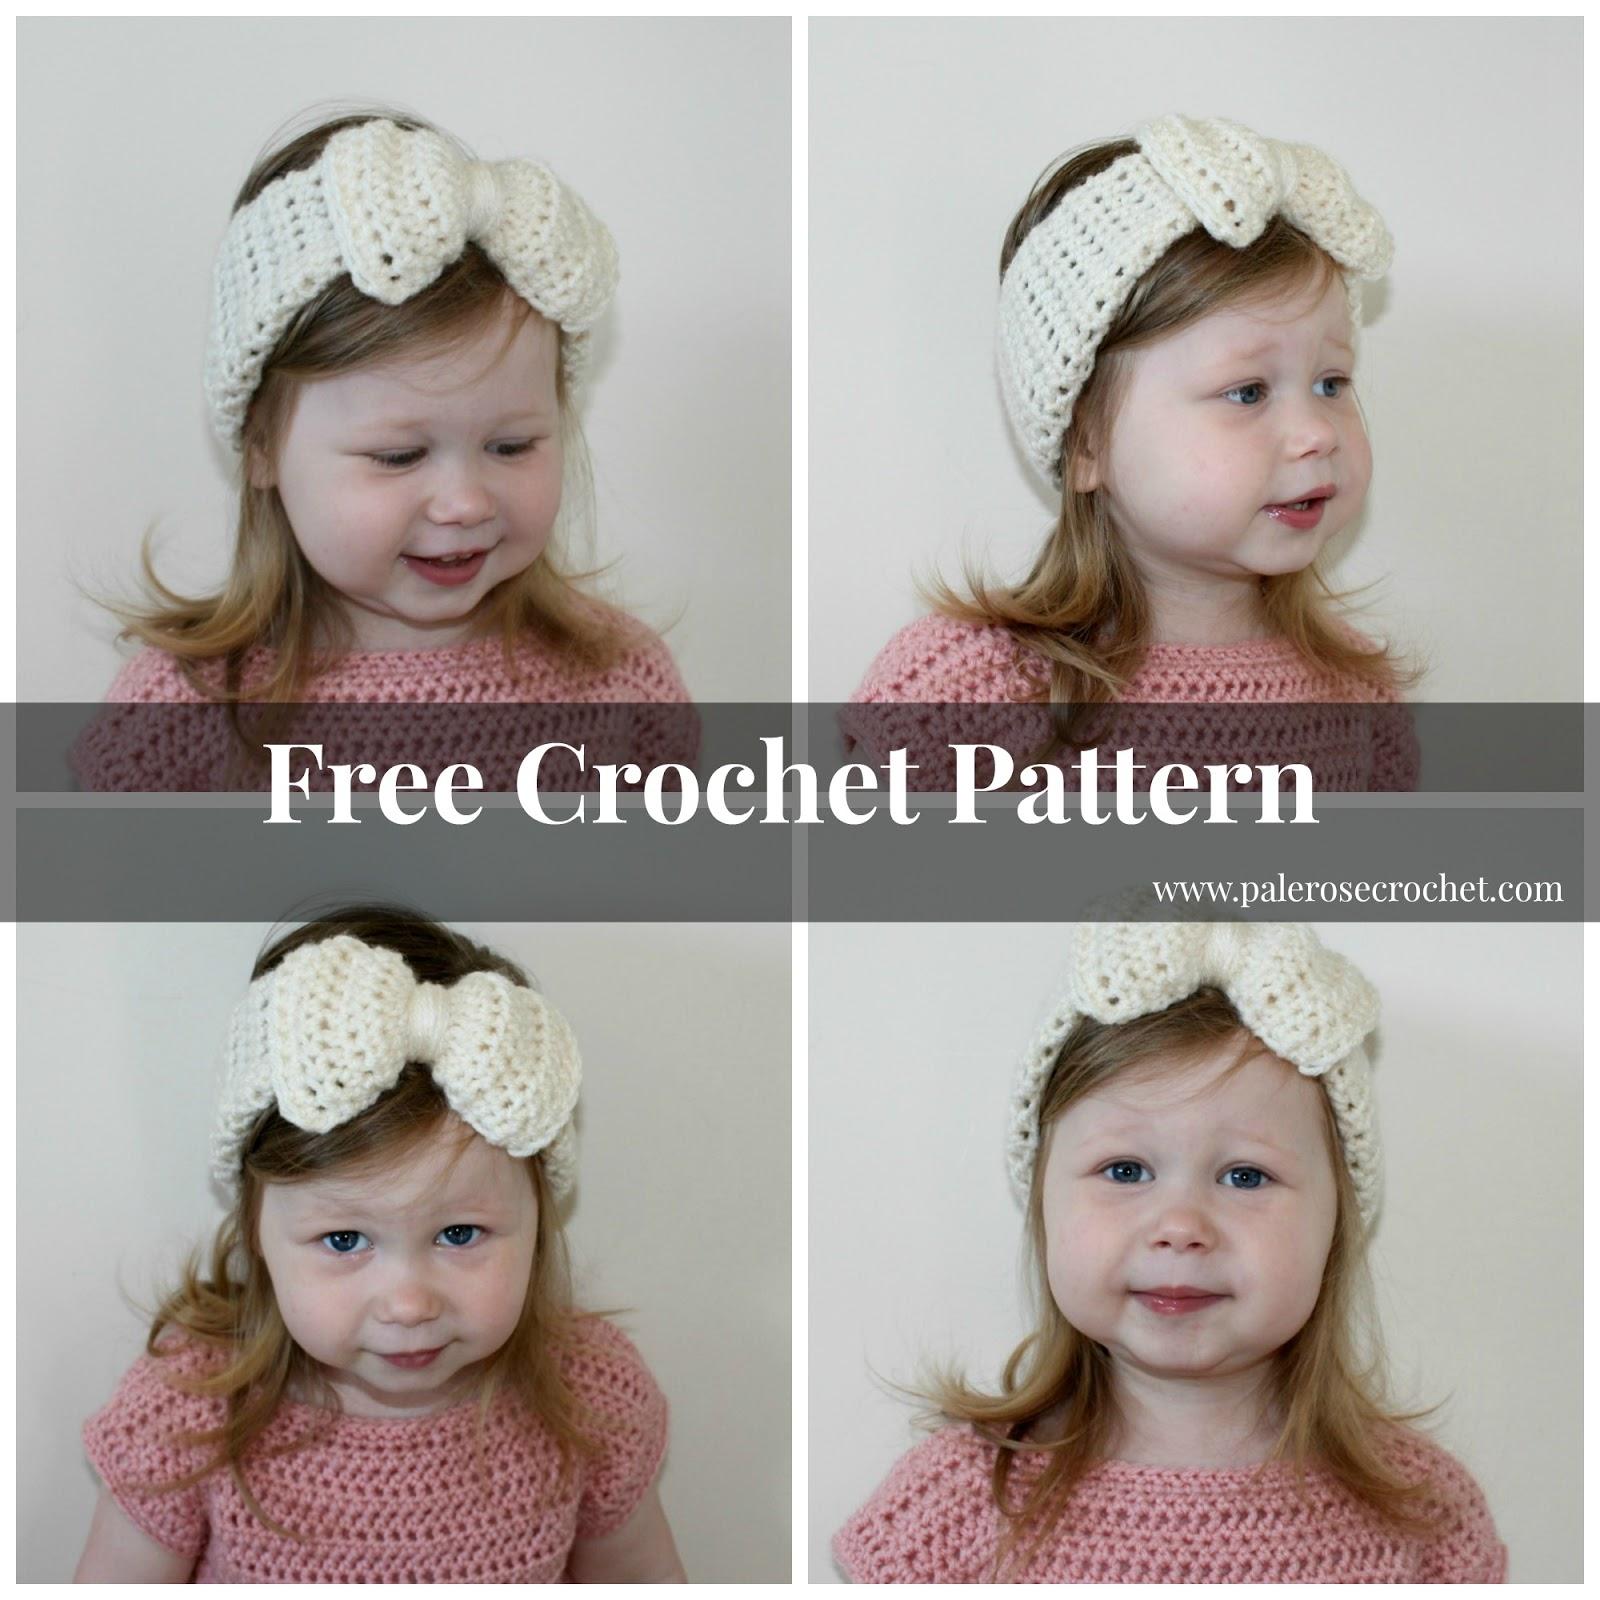 Crochet Pattern For Toddler Headband : Crochet Patterns Galore - Toddler Bow Headband